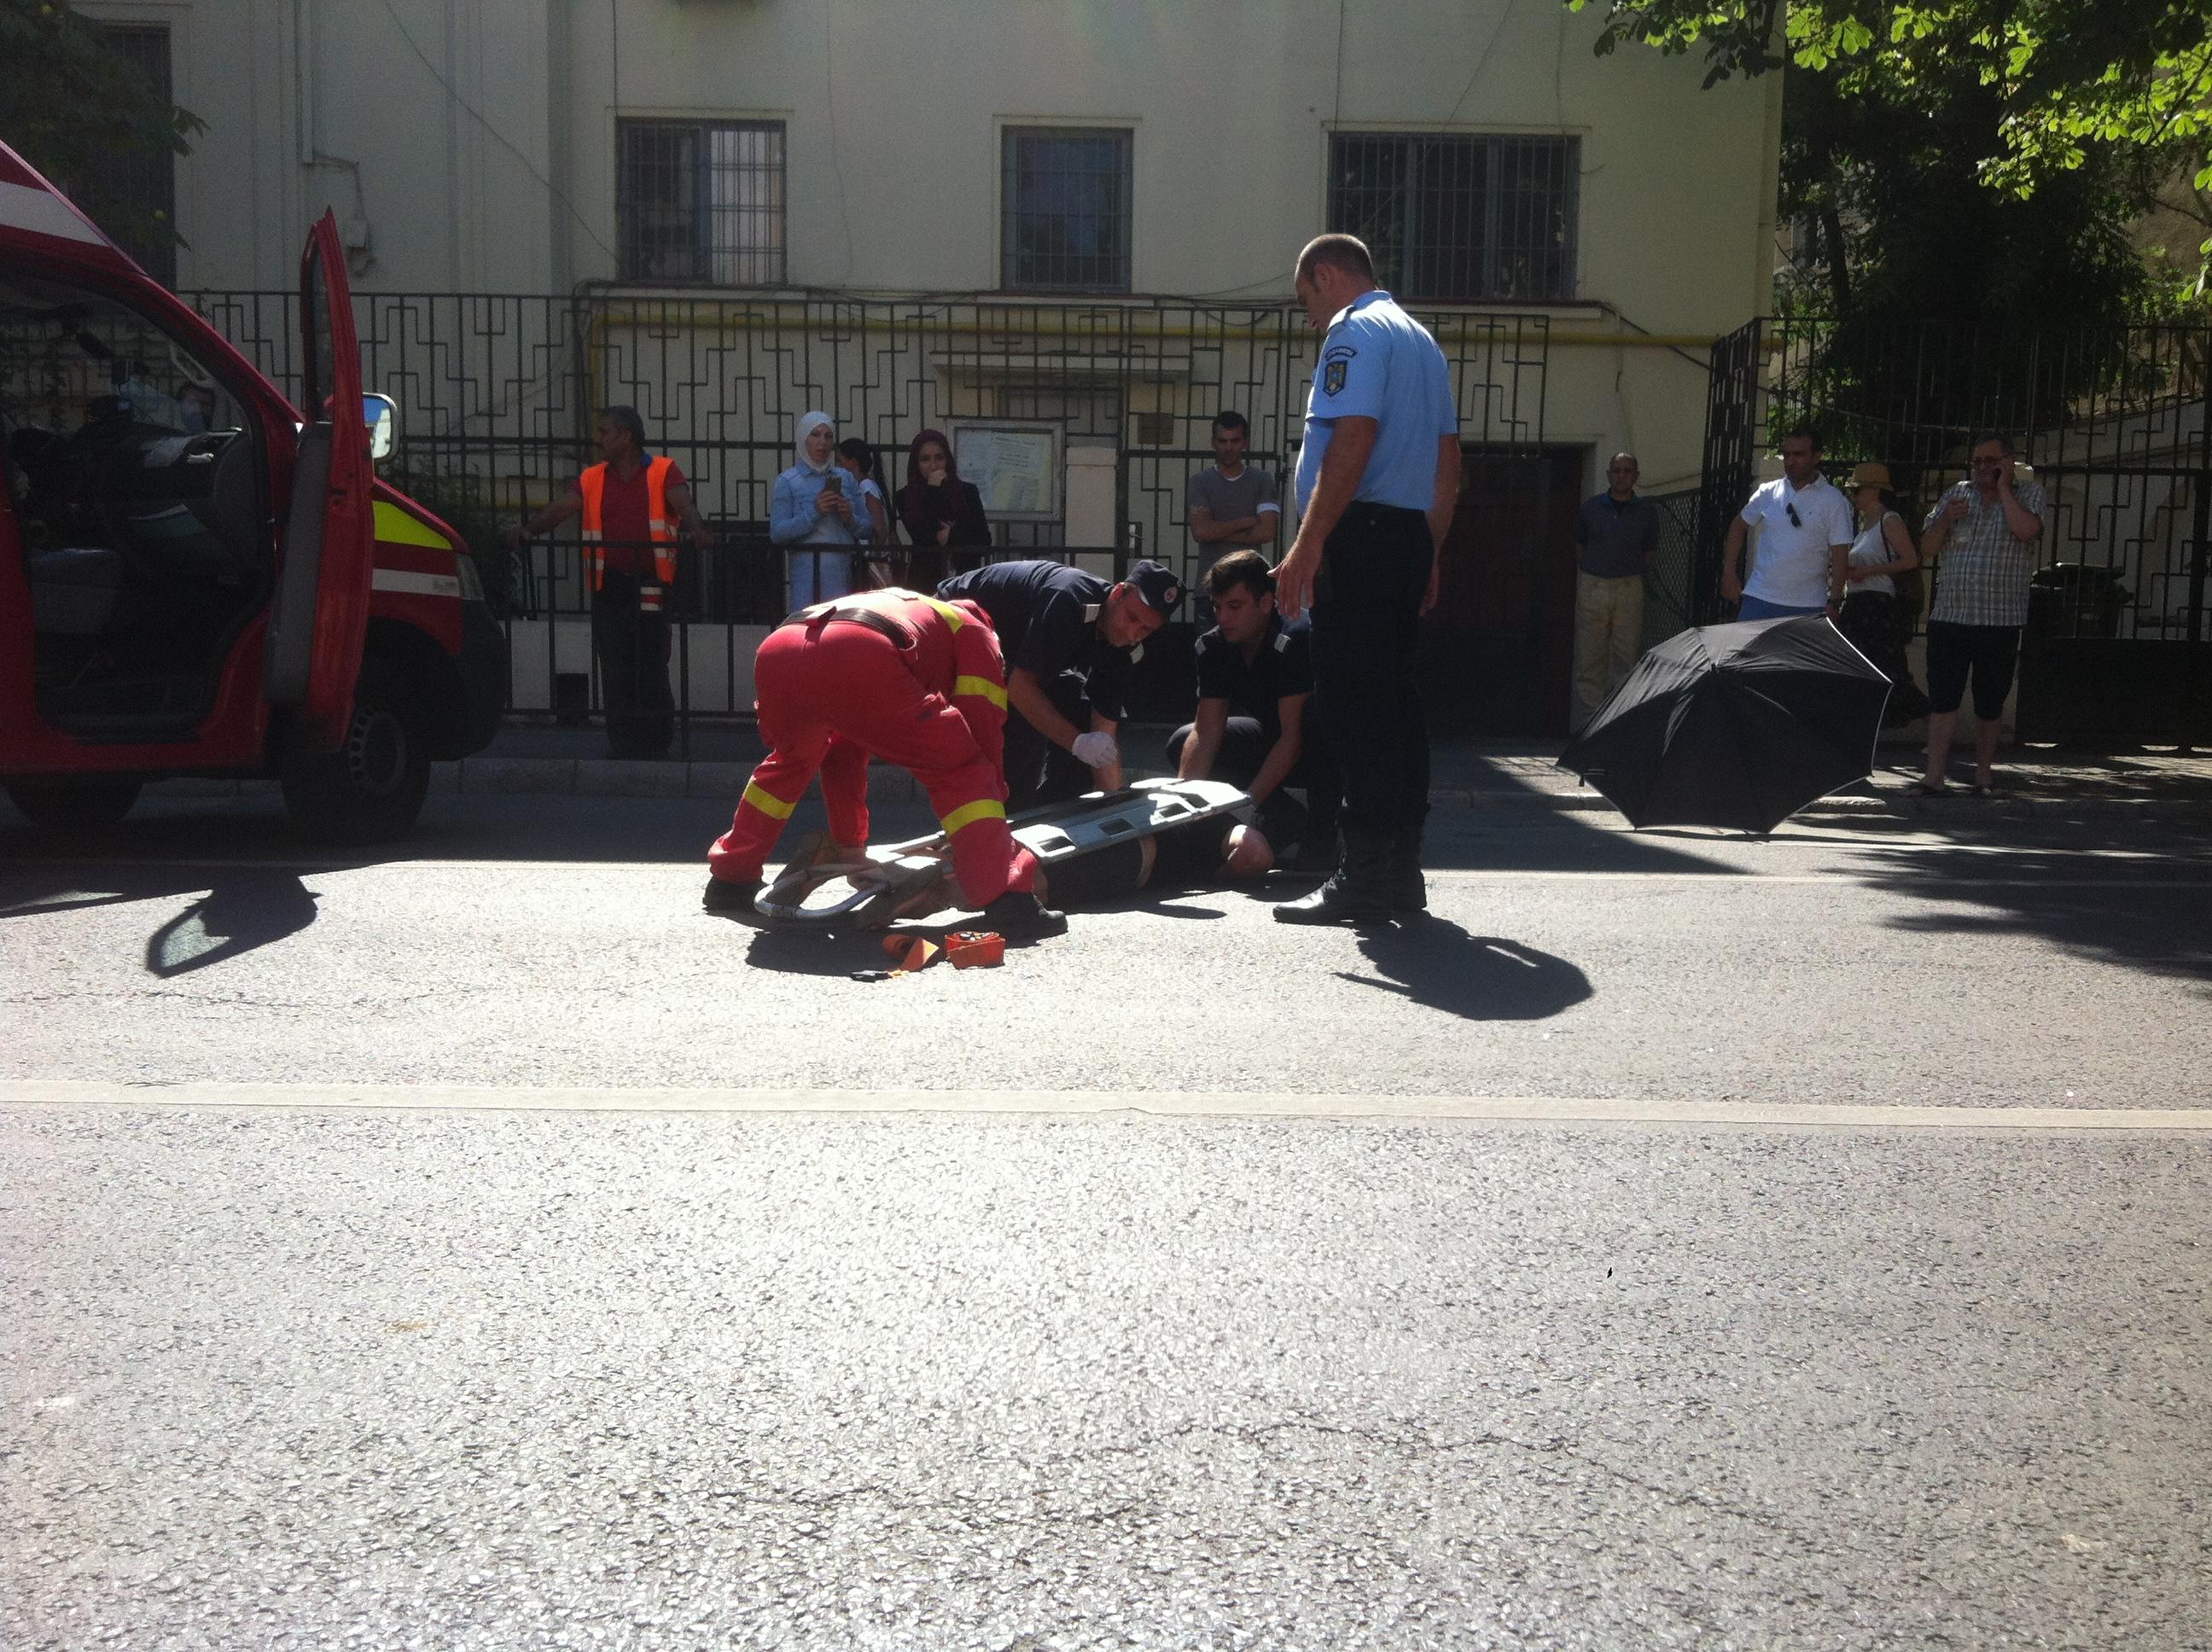 O femeie a sarit in fata unei masini pe strada Polona, iar soferul nu a mai avut cum sa evite impactul